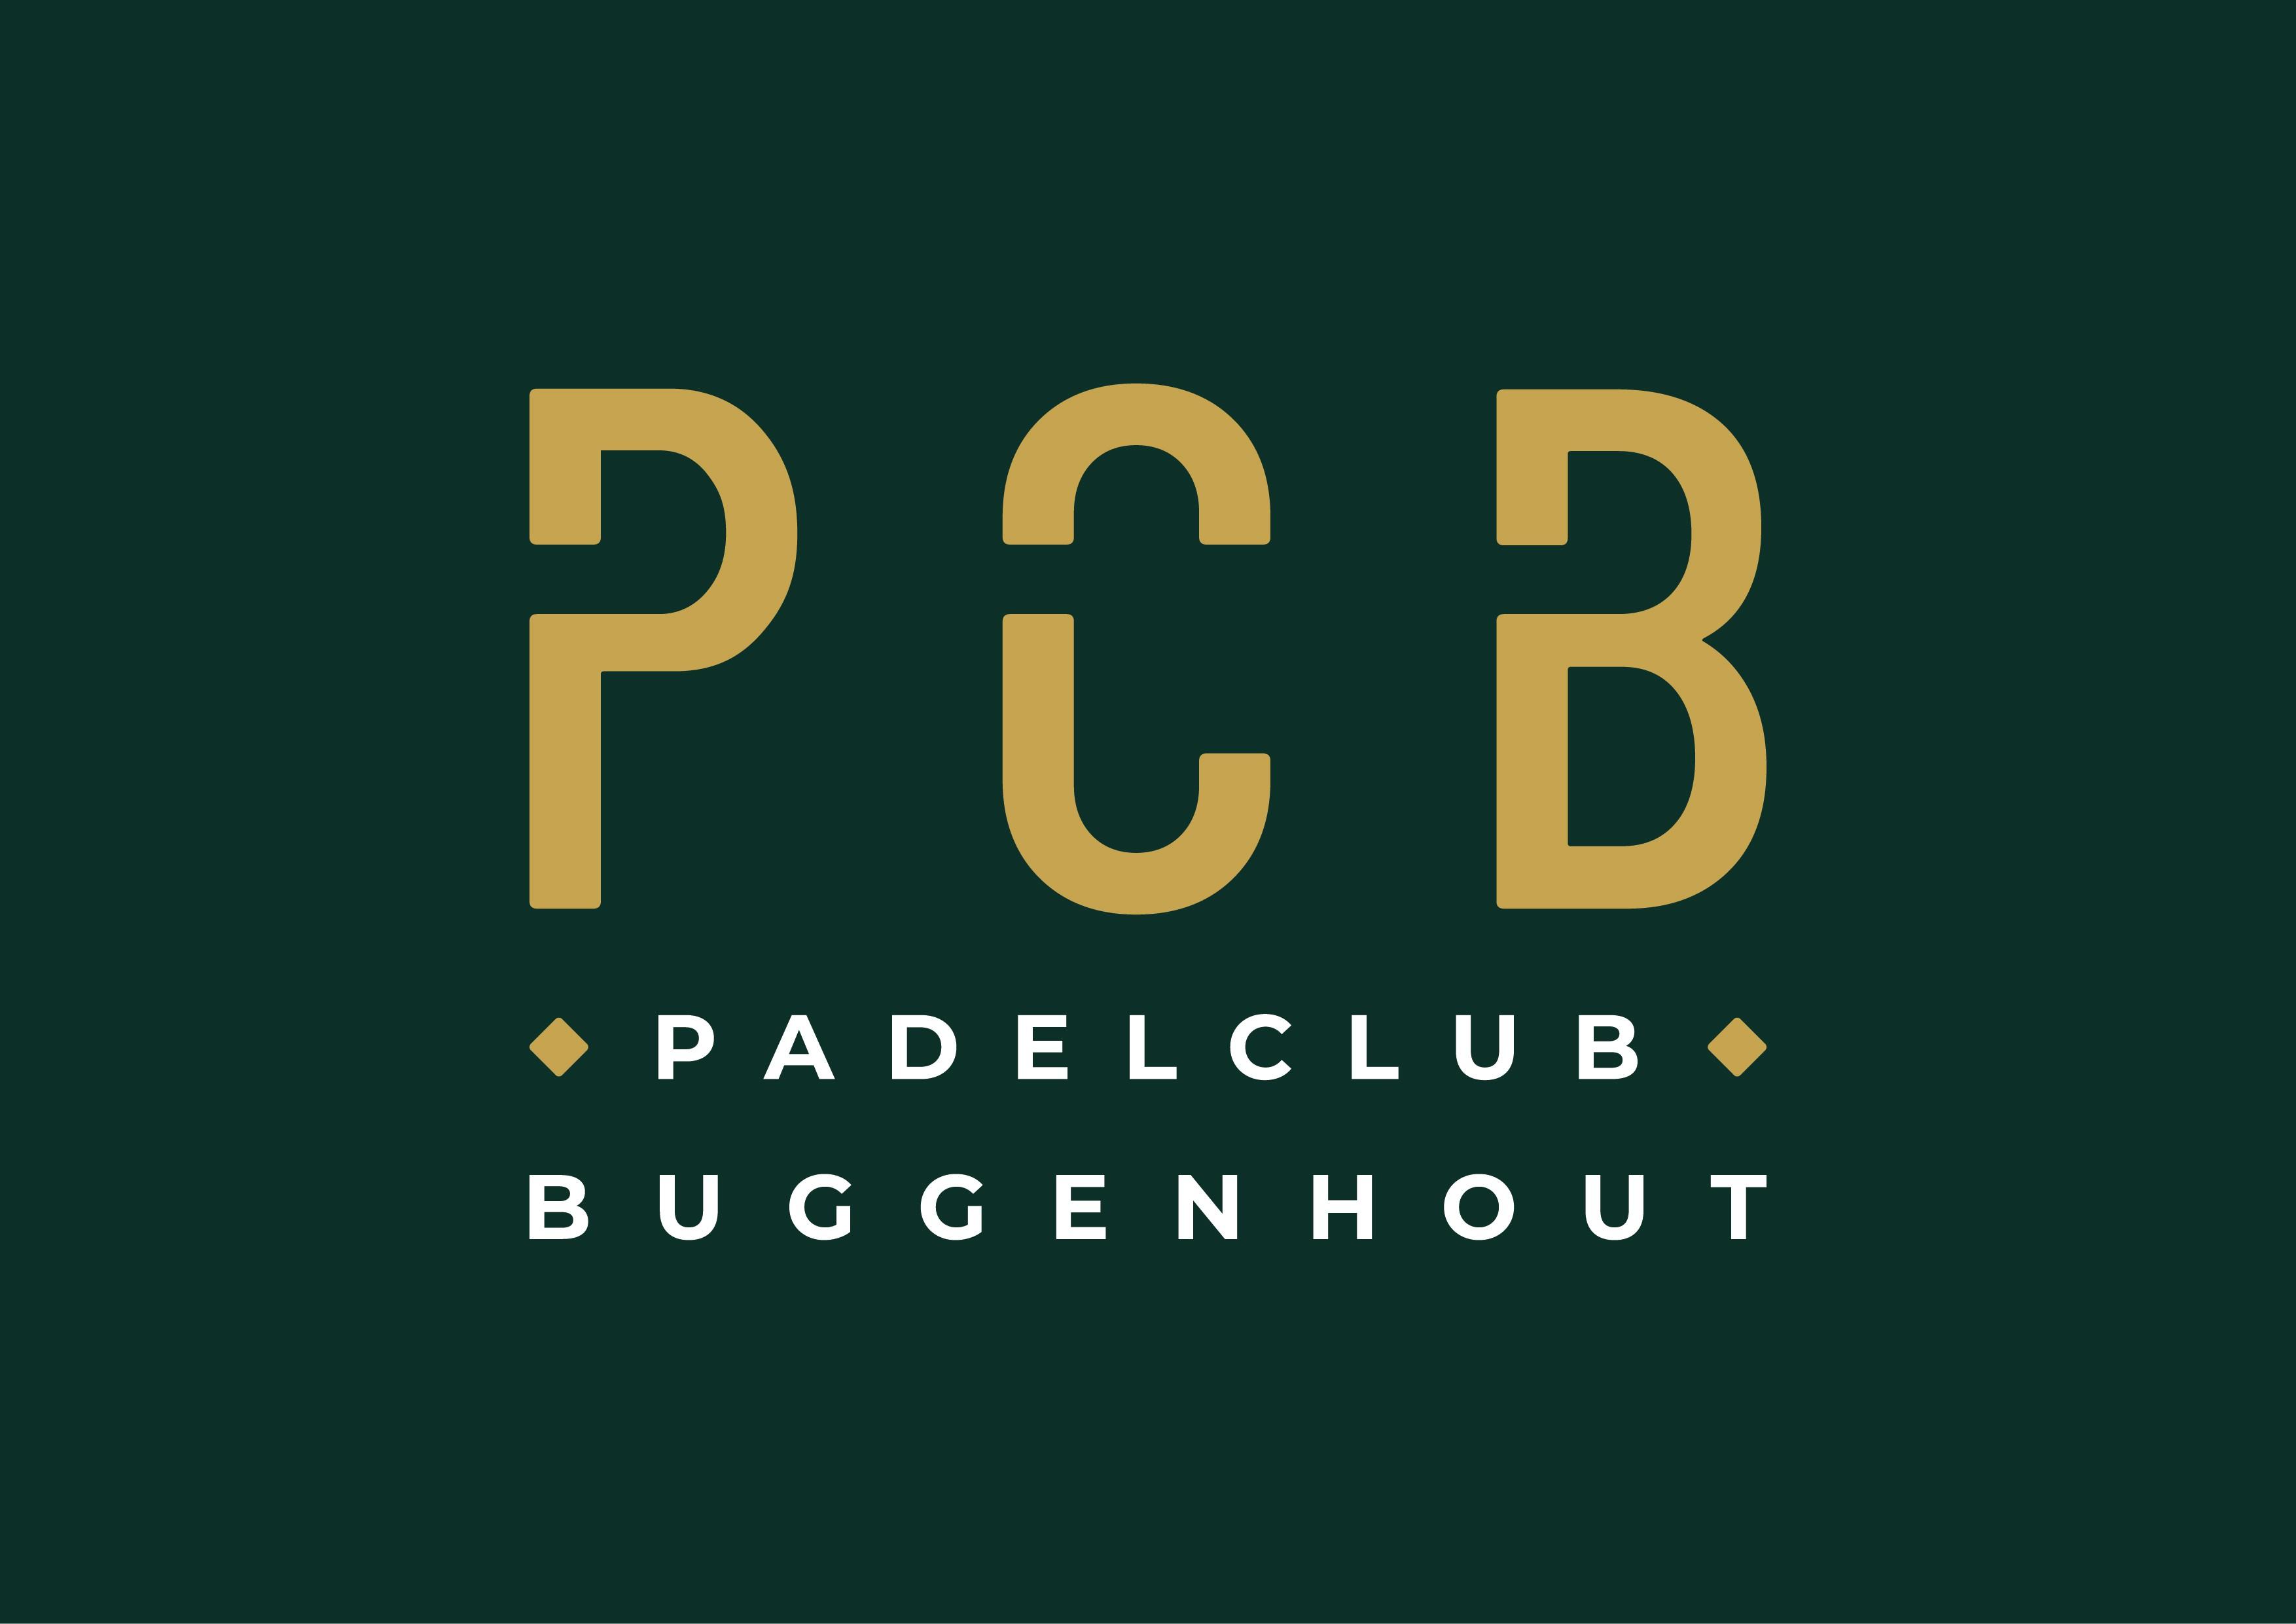 Design a logo for a new padel club